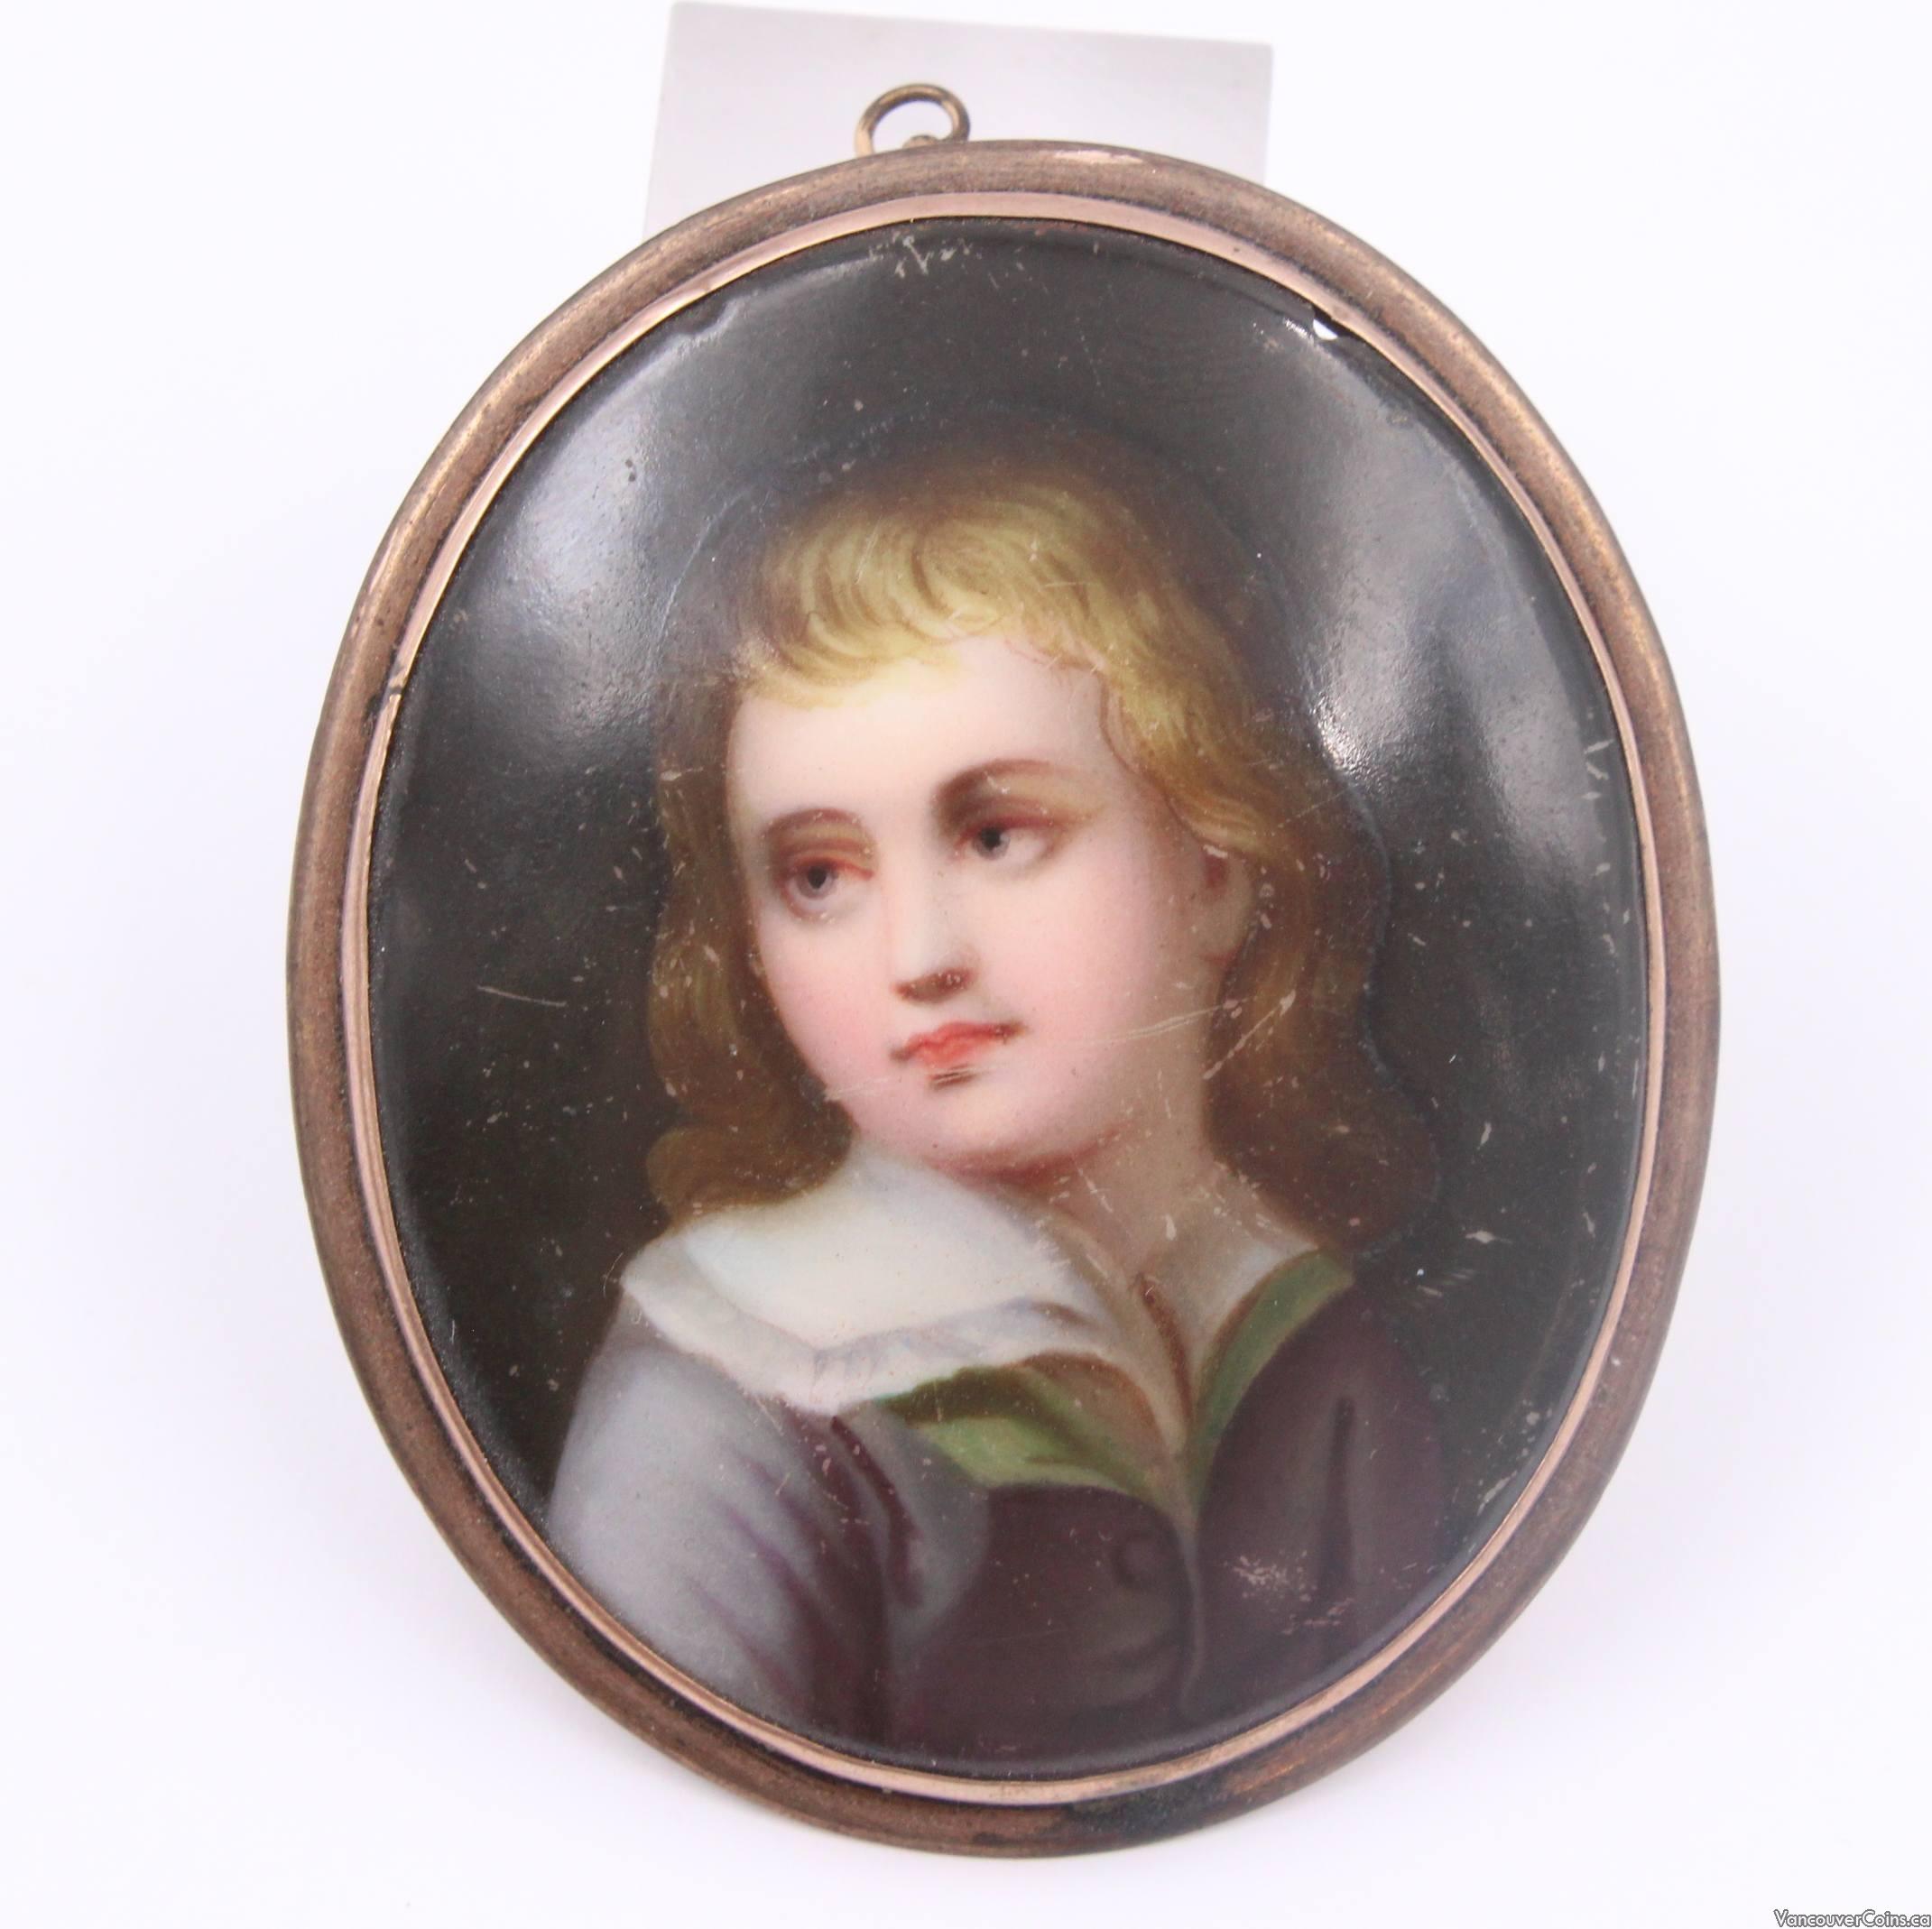 c1800 miniature porcelain painting 10K gold bezel on brass frame